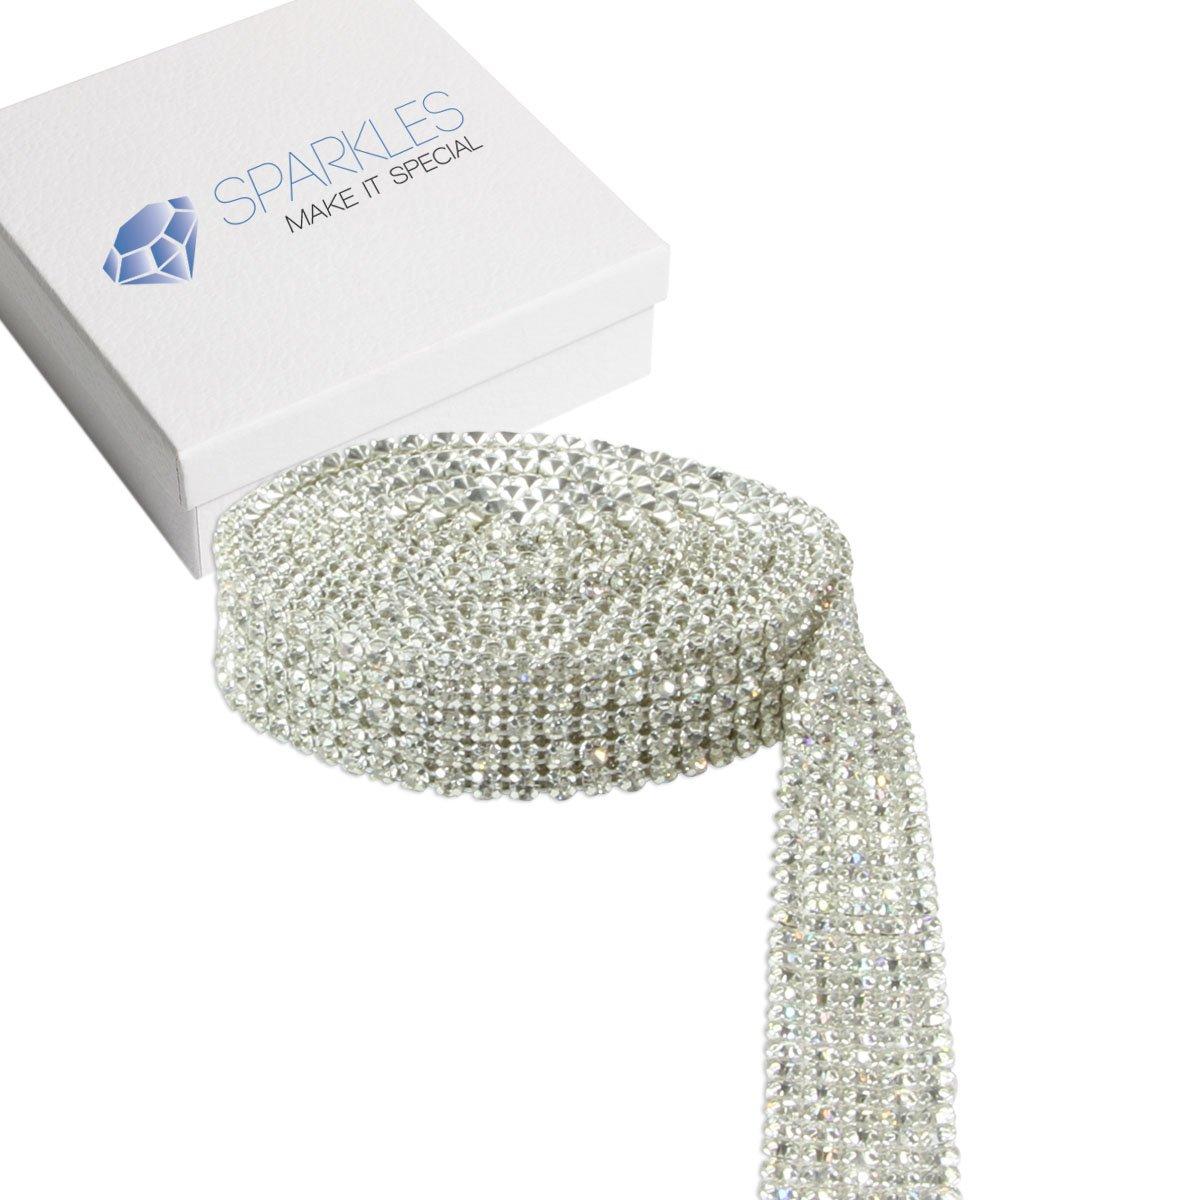 Sparkles Make It Special 5 Row Crystal Diamond Genuine SS19 Rhinestone Ribbon Trim - 3 Yards Premium Professional Wedding Cake Banding - Silver by Sparkles Make It Special